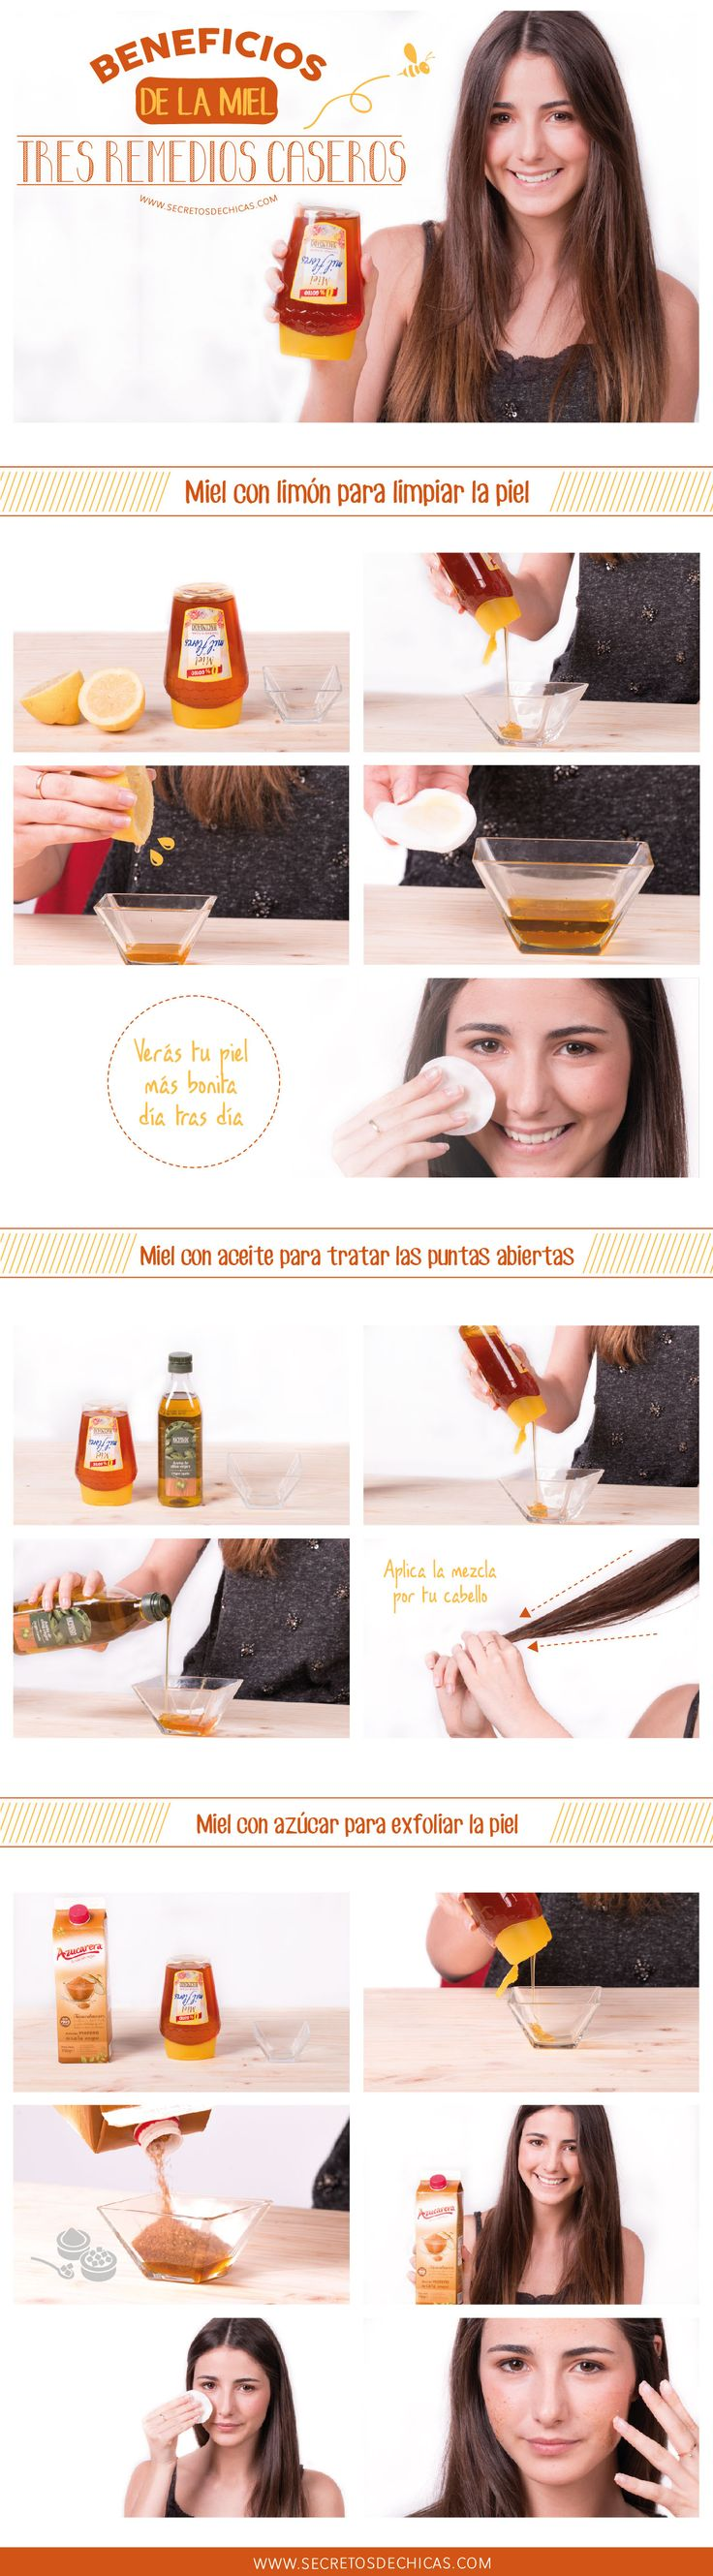 Beneficios de la miel + 3 remedios caseros. #belleza #estética http://mejoresremediosnaturales.blogspotcom #remedios #caseros #dolor #cabeza #popular